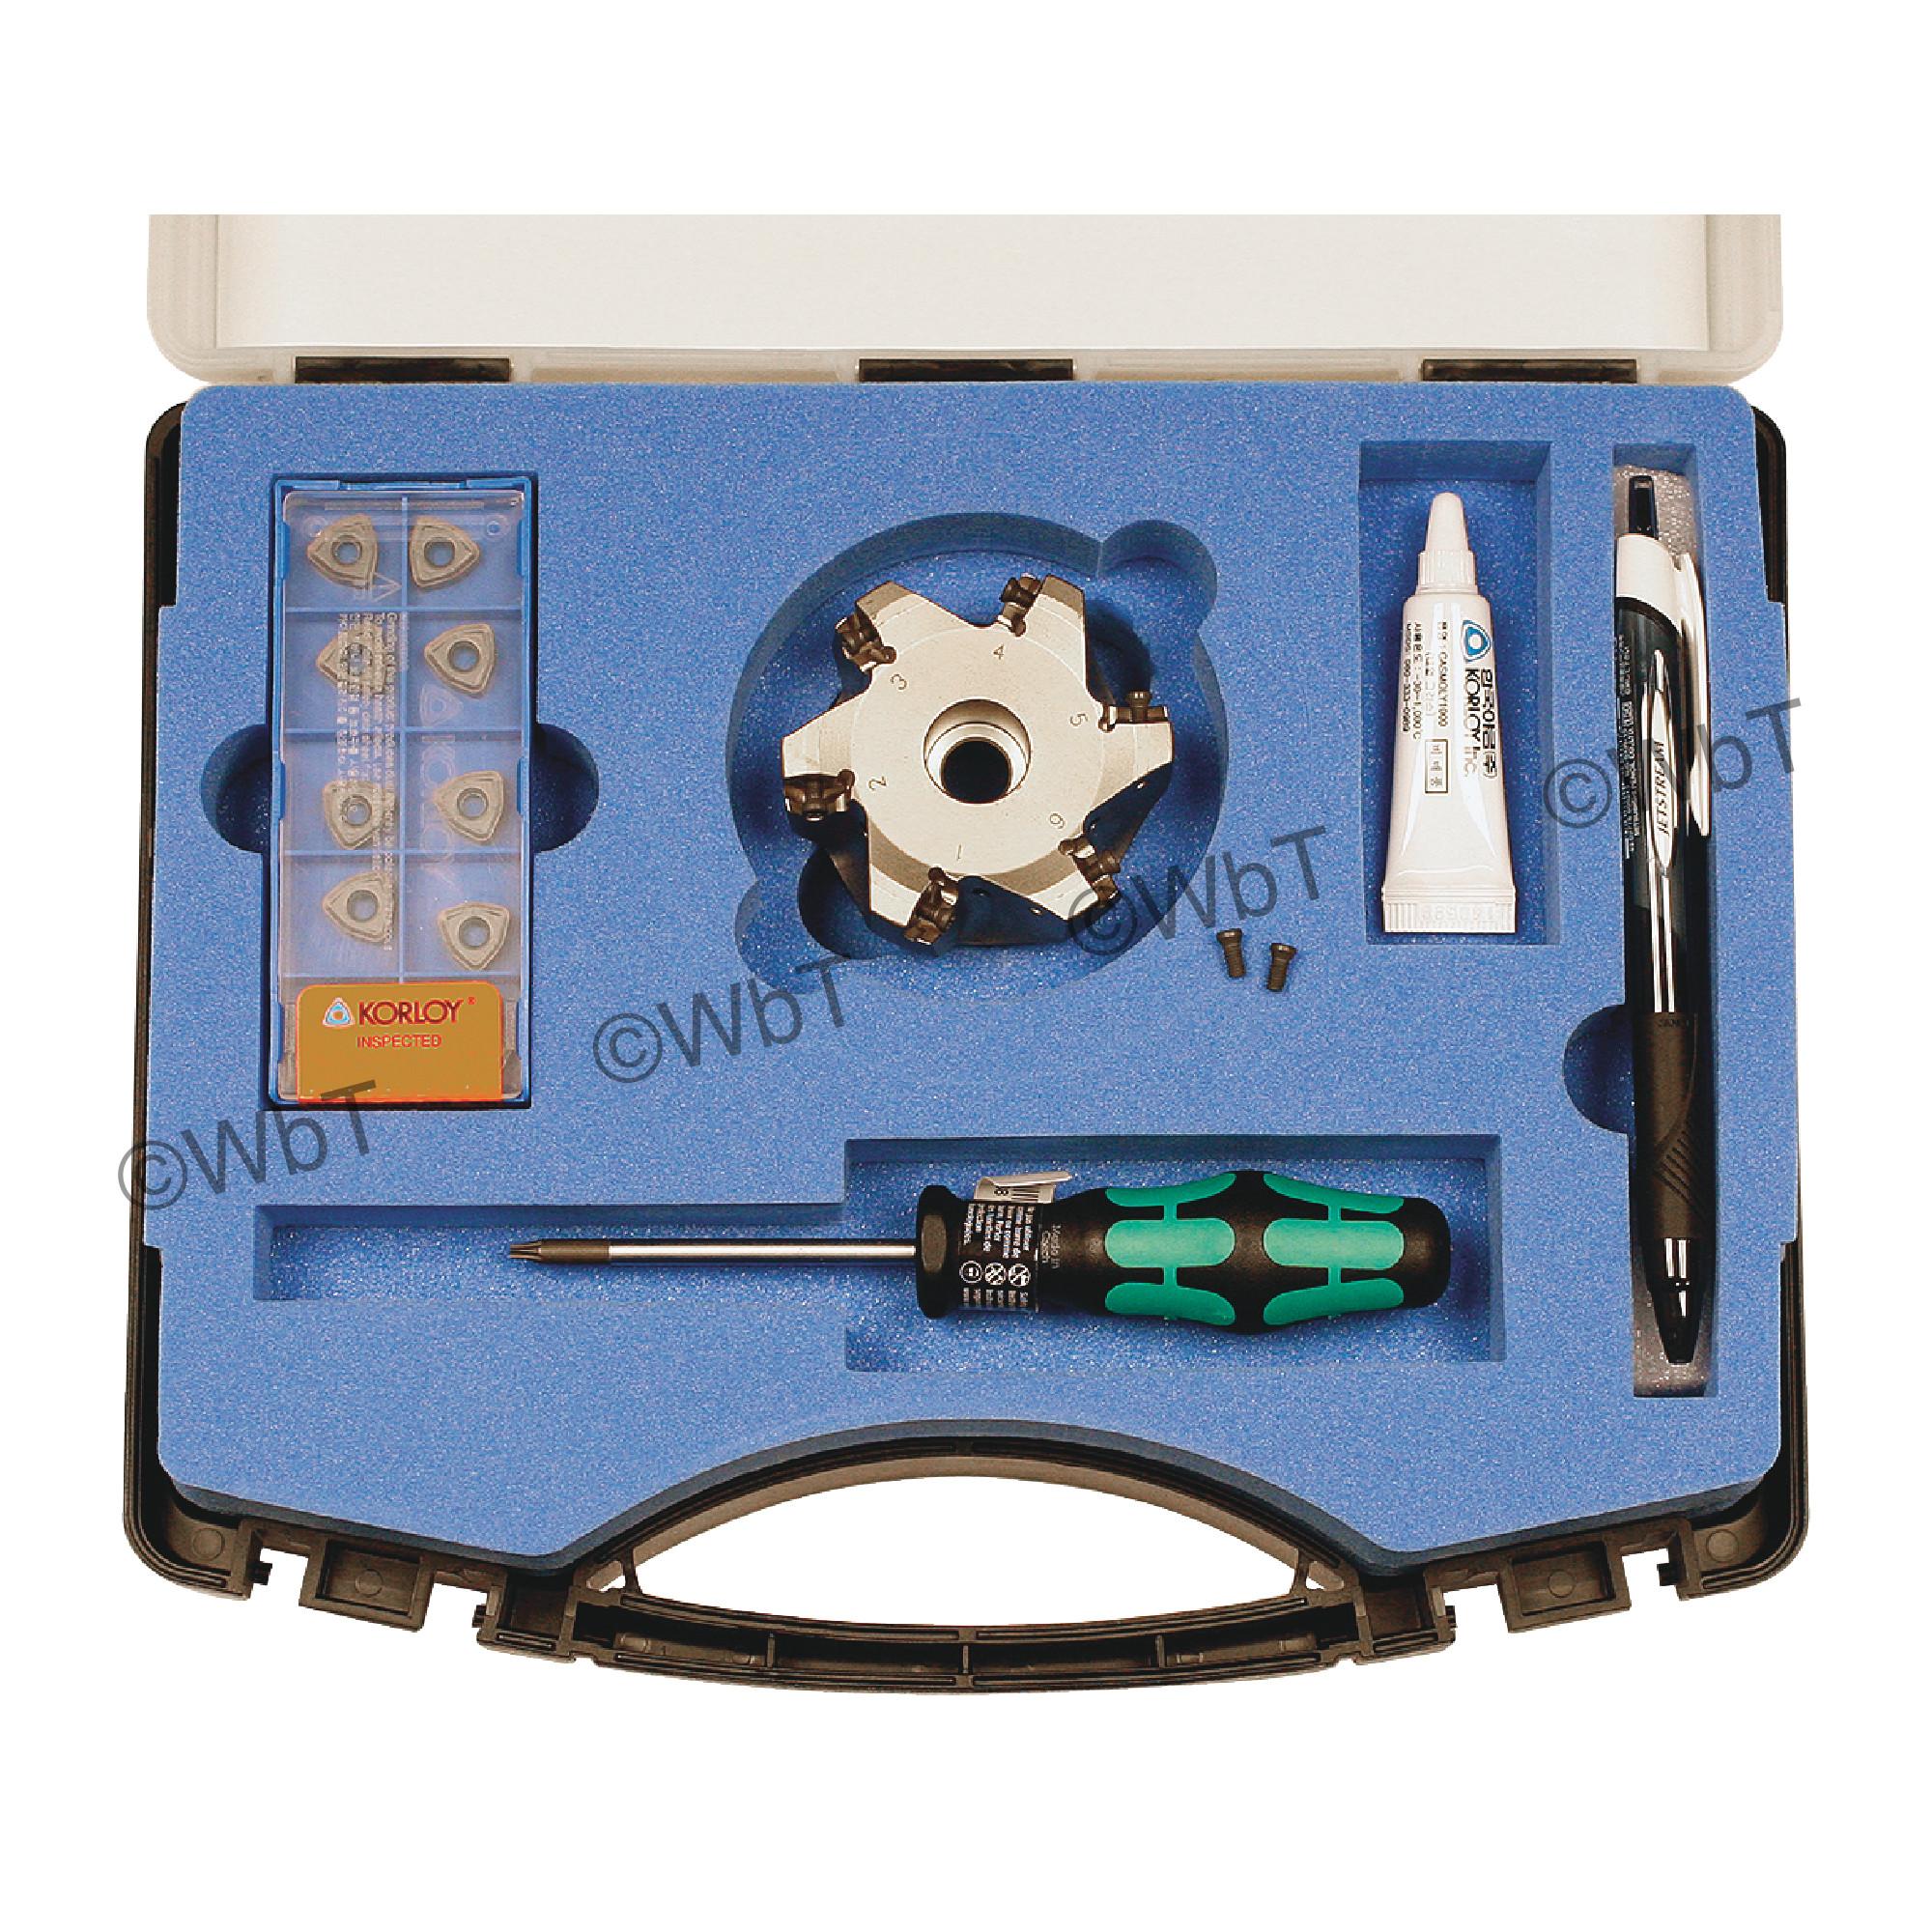 "KORLOY - 2.500"" High-Feed Face Mill Set / Includes: (1) HRMDCA09250HR-6 (2.5"" ø) & (10) WNMX09T316ZNN-MM PC5300 C"